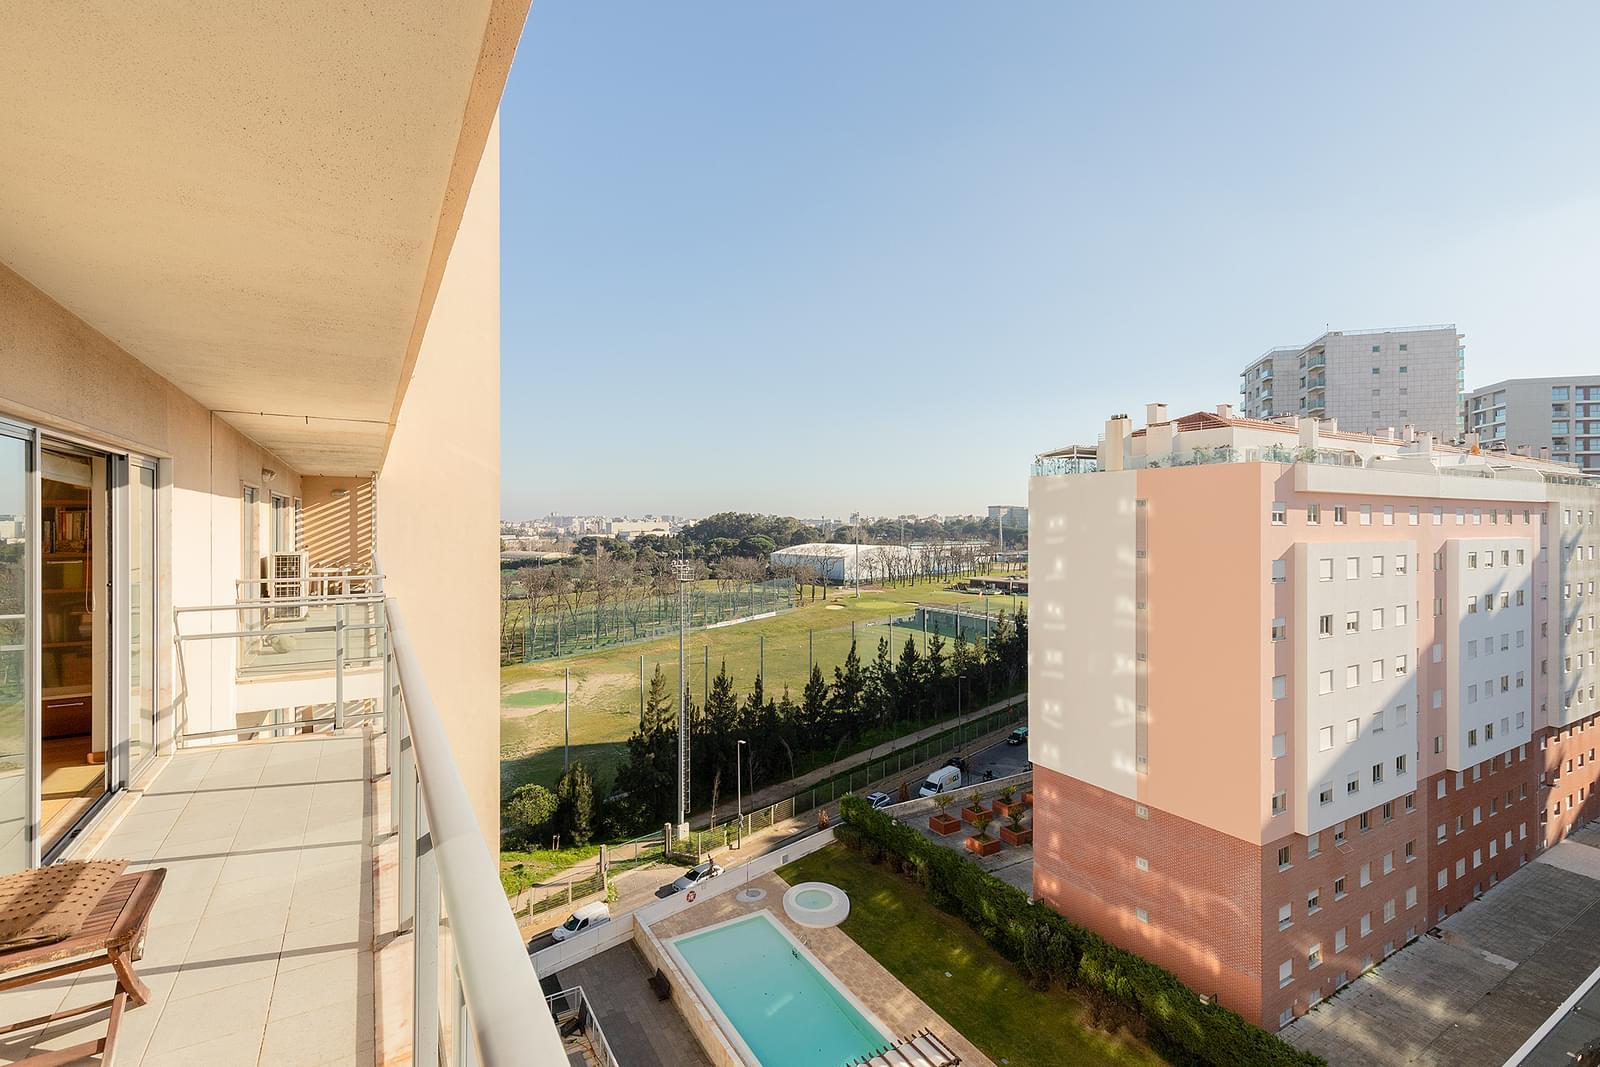 pf18953-apartamento-t3-lisboa-f8ccc417-f865-42dd-99d8-d90aea7f1c4d